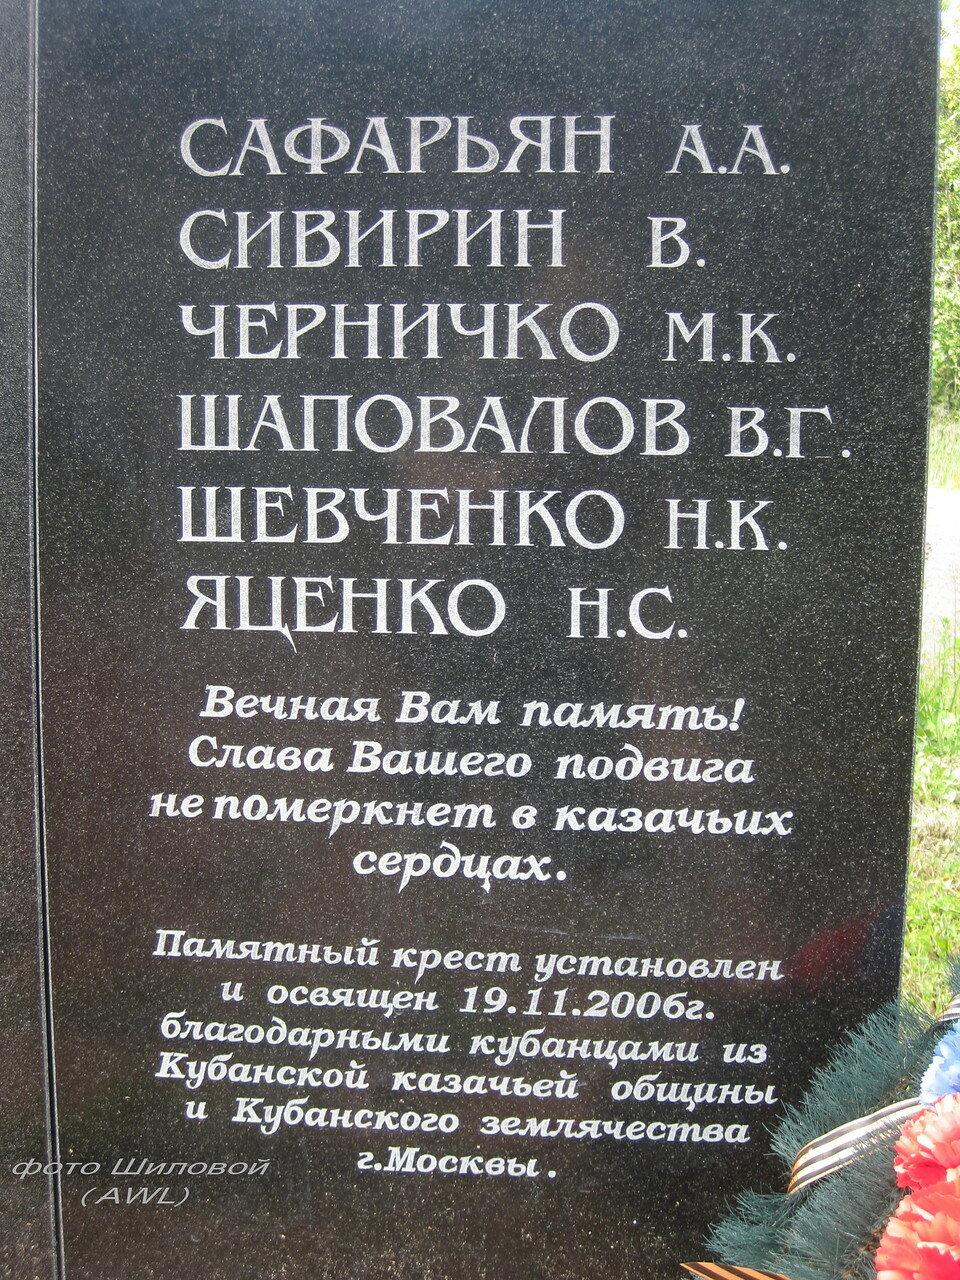 https://img-fotki.yandex.ru/get/31412/199368979.1c/0_1bdf4f_a1ce5237_XXXL.jpg